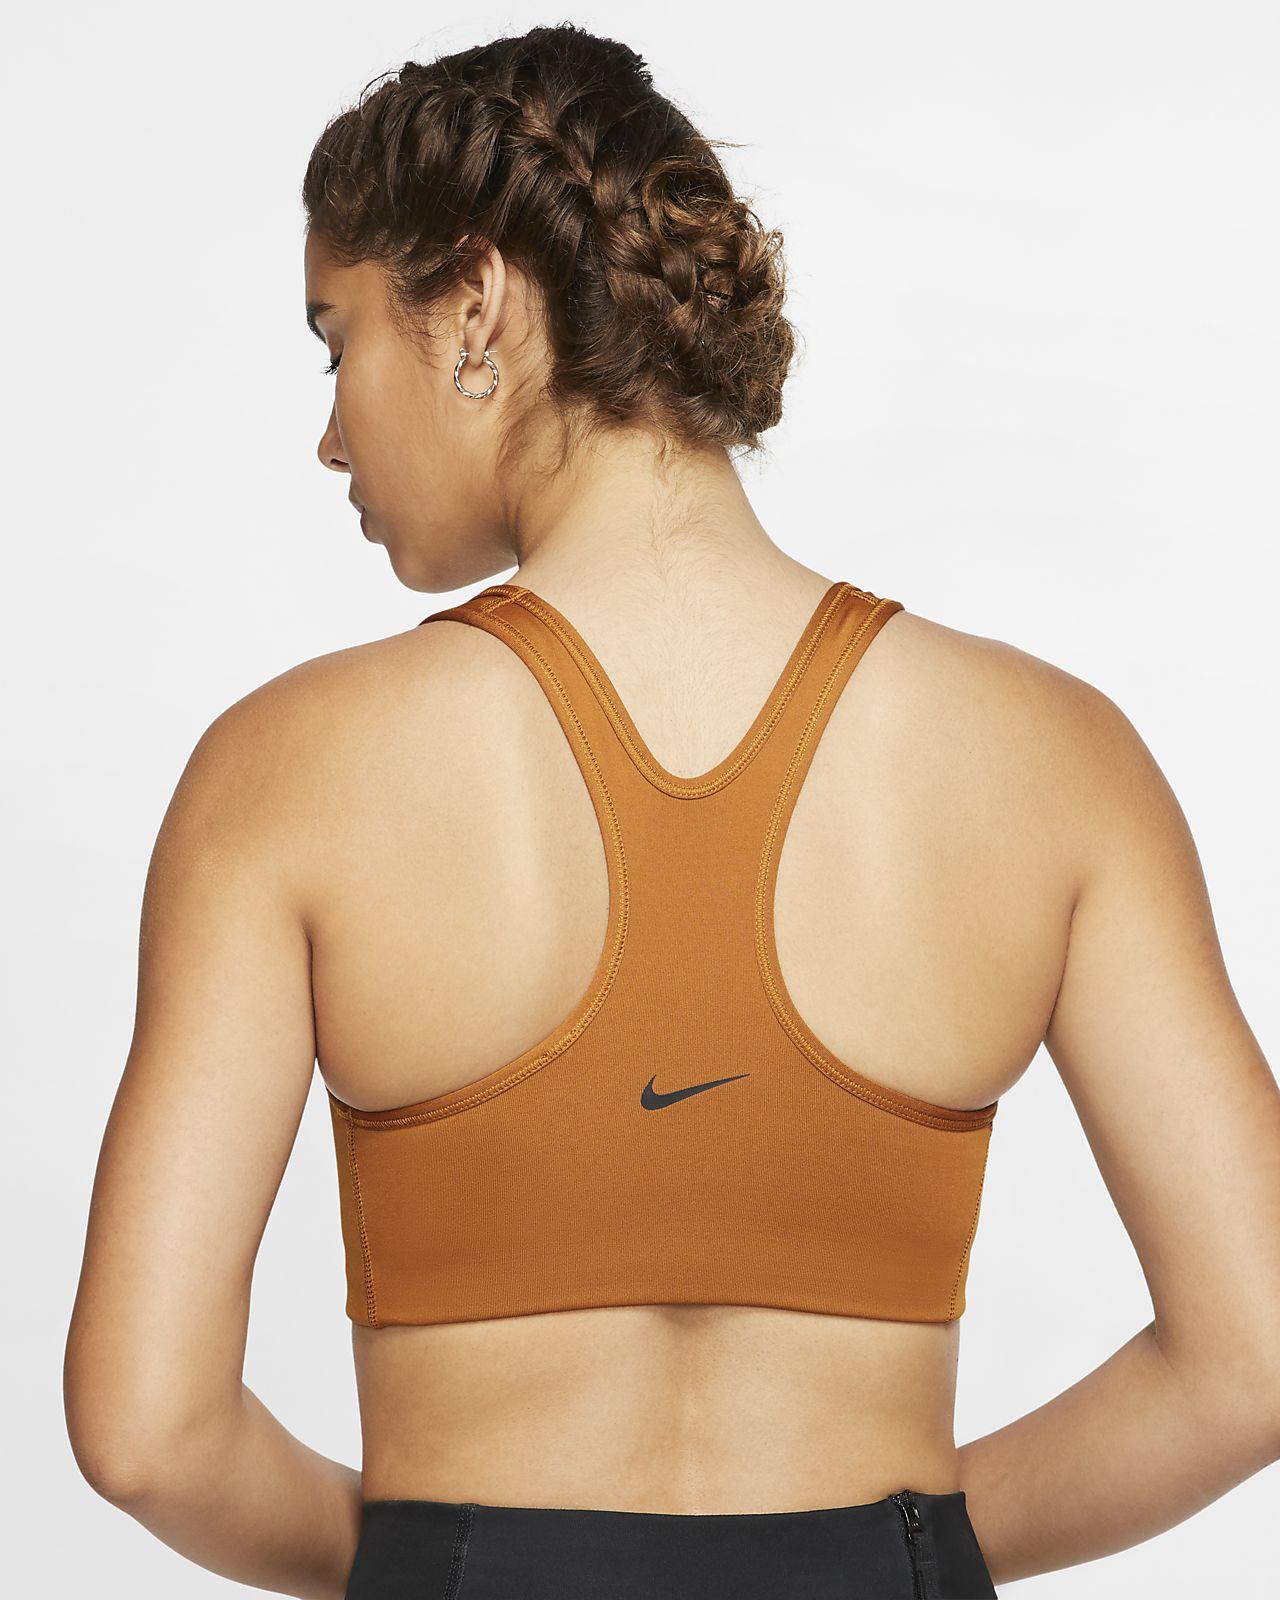 ed42a978 Nike Rebel Swoosh Women's JDI Medium-Support Sports Bra